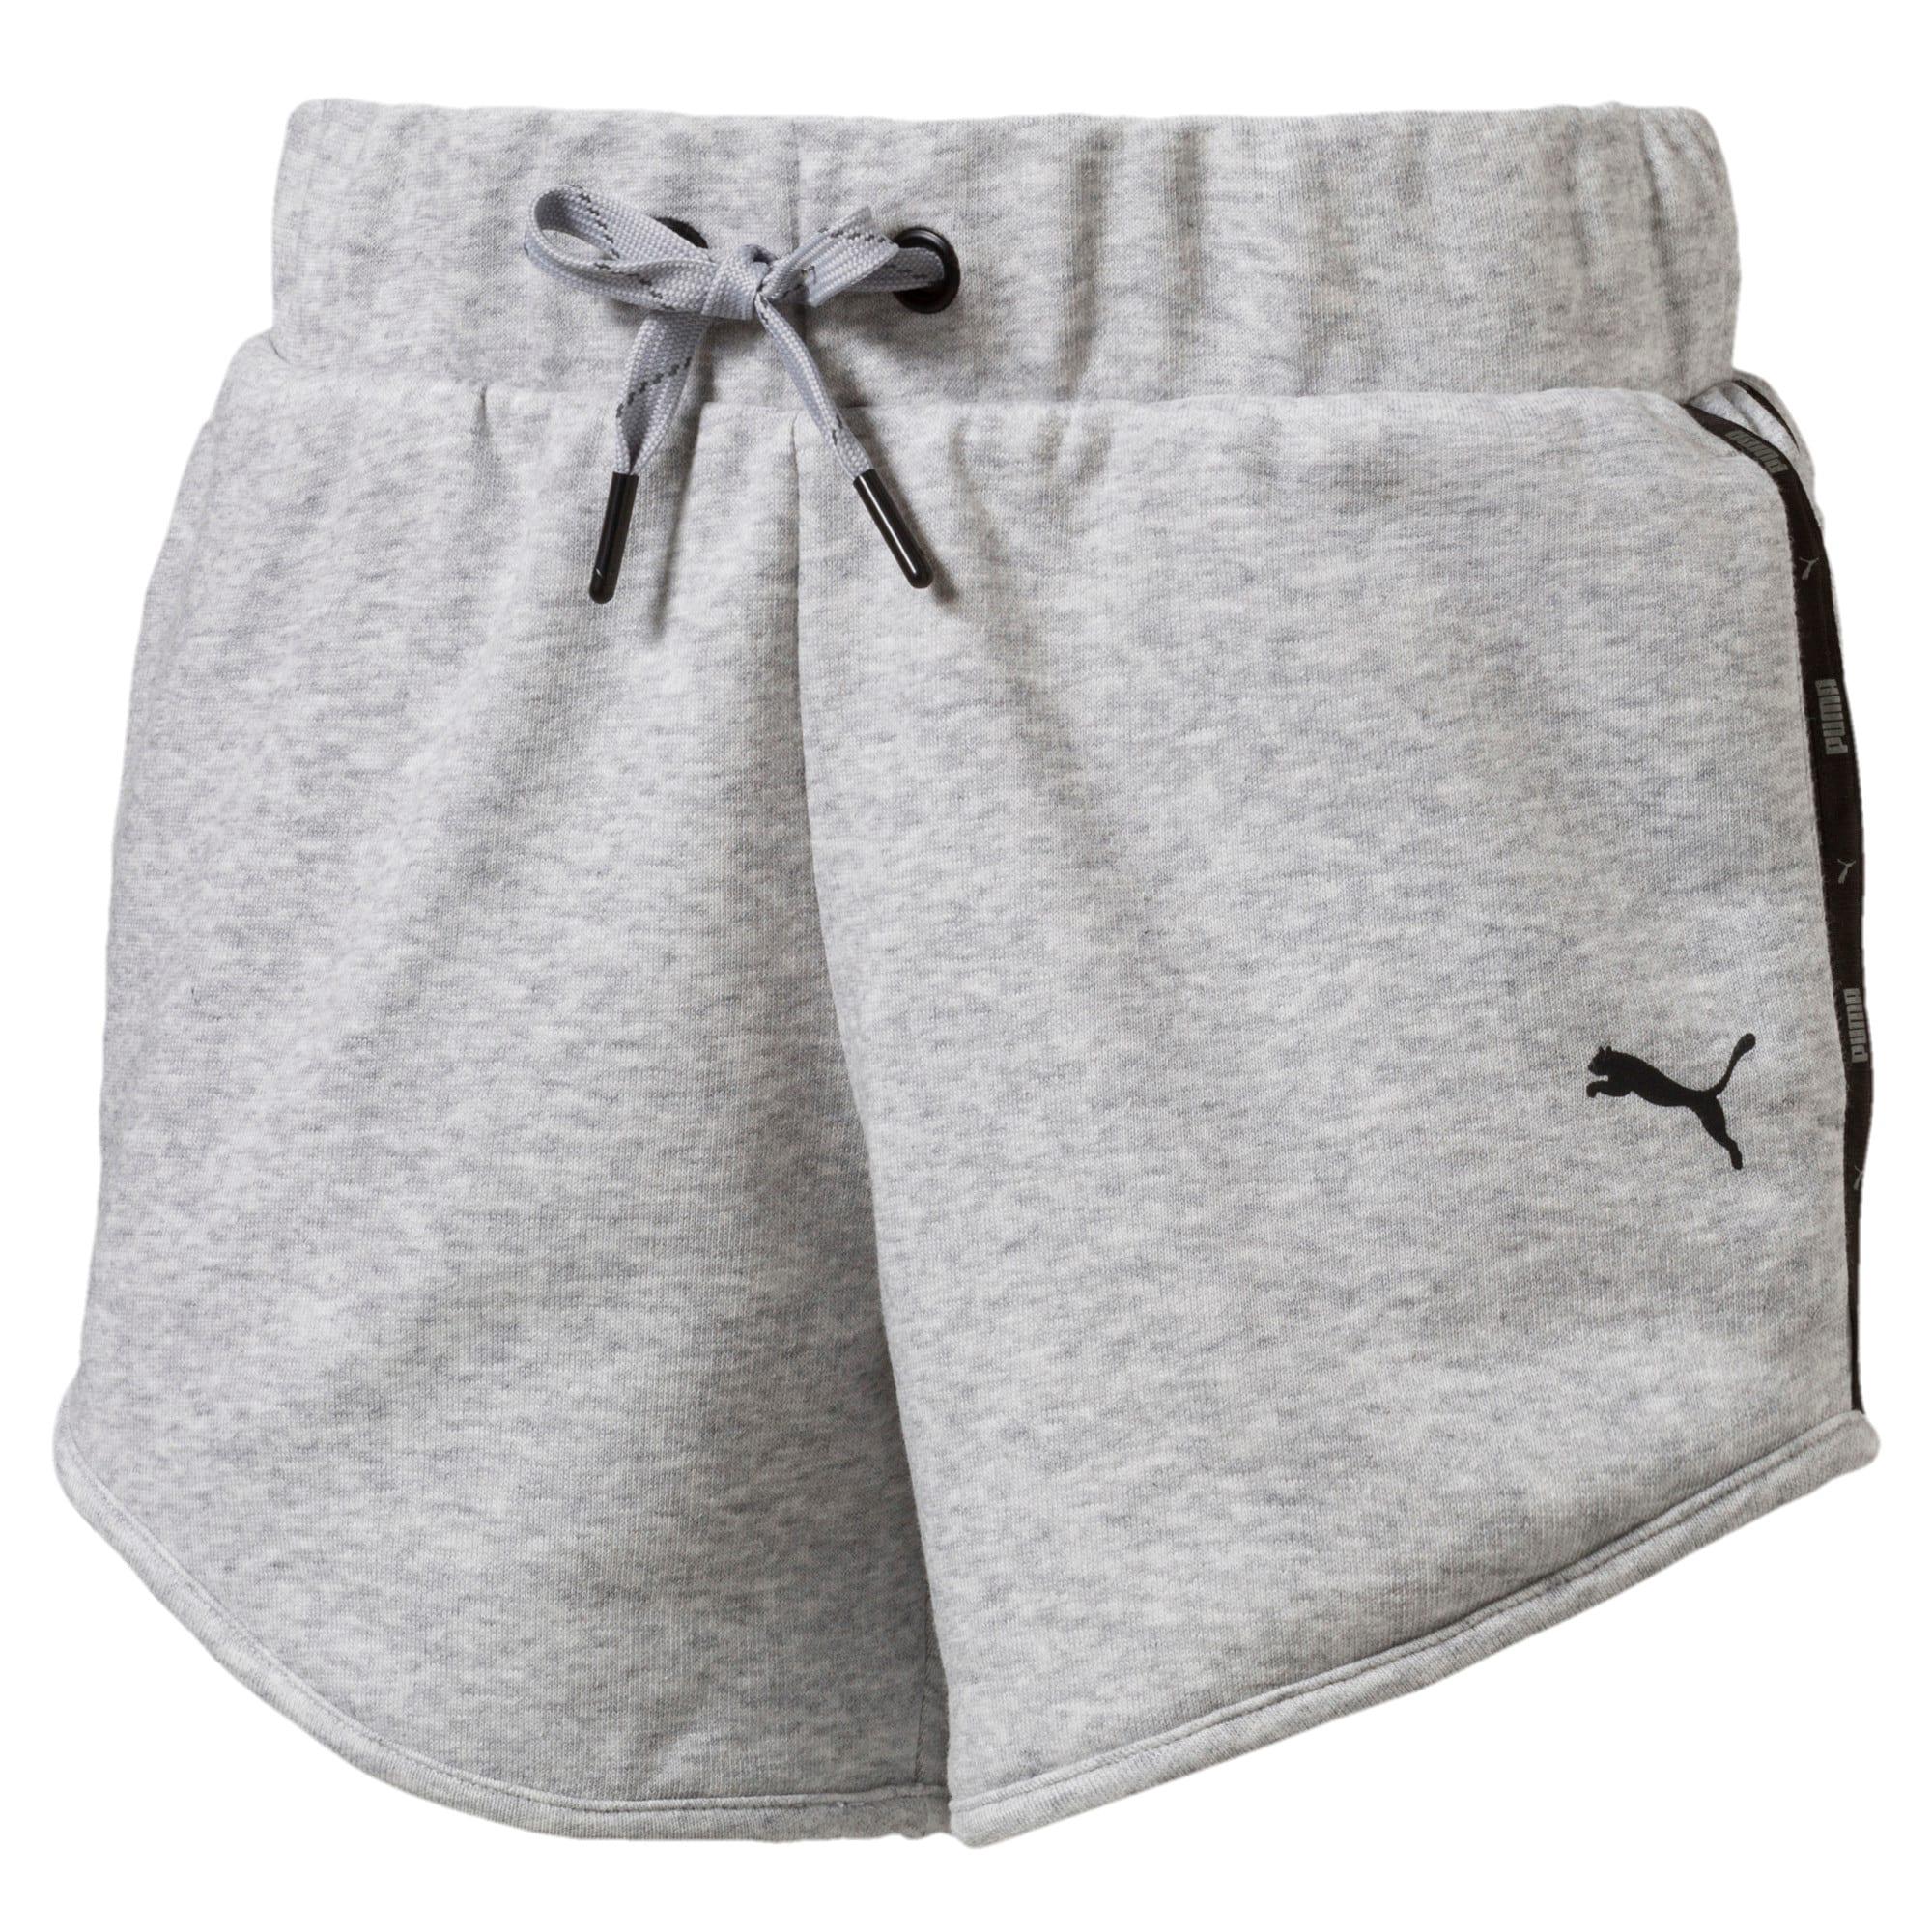 Thumbnail 1 of Girls' Sportstyle Sweat Shorts, Light Gray Heather, medium-IND